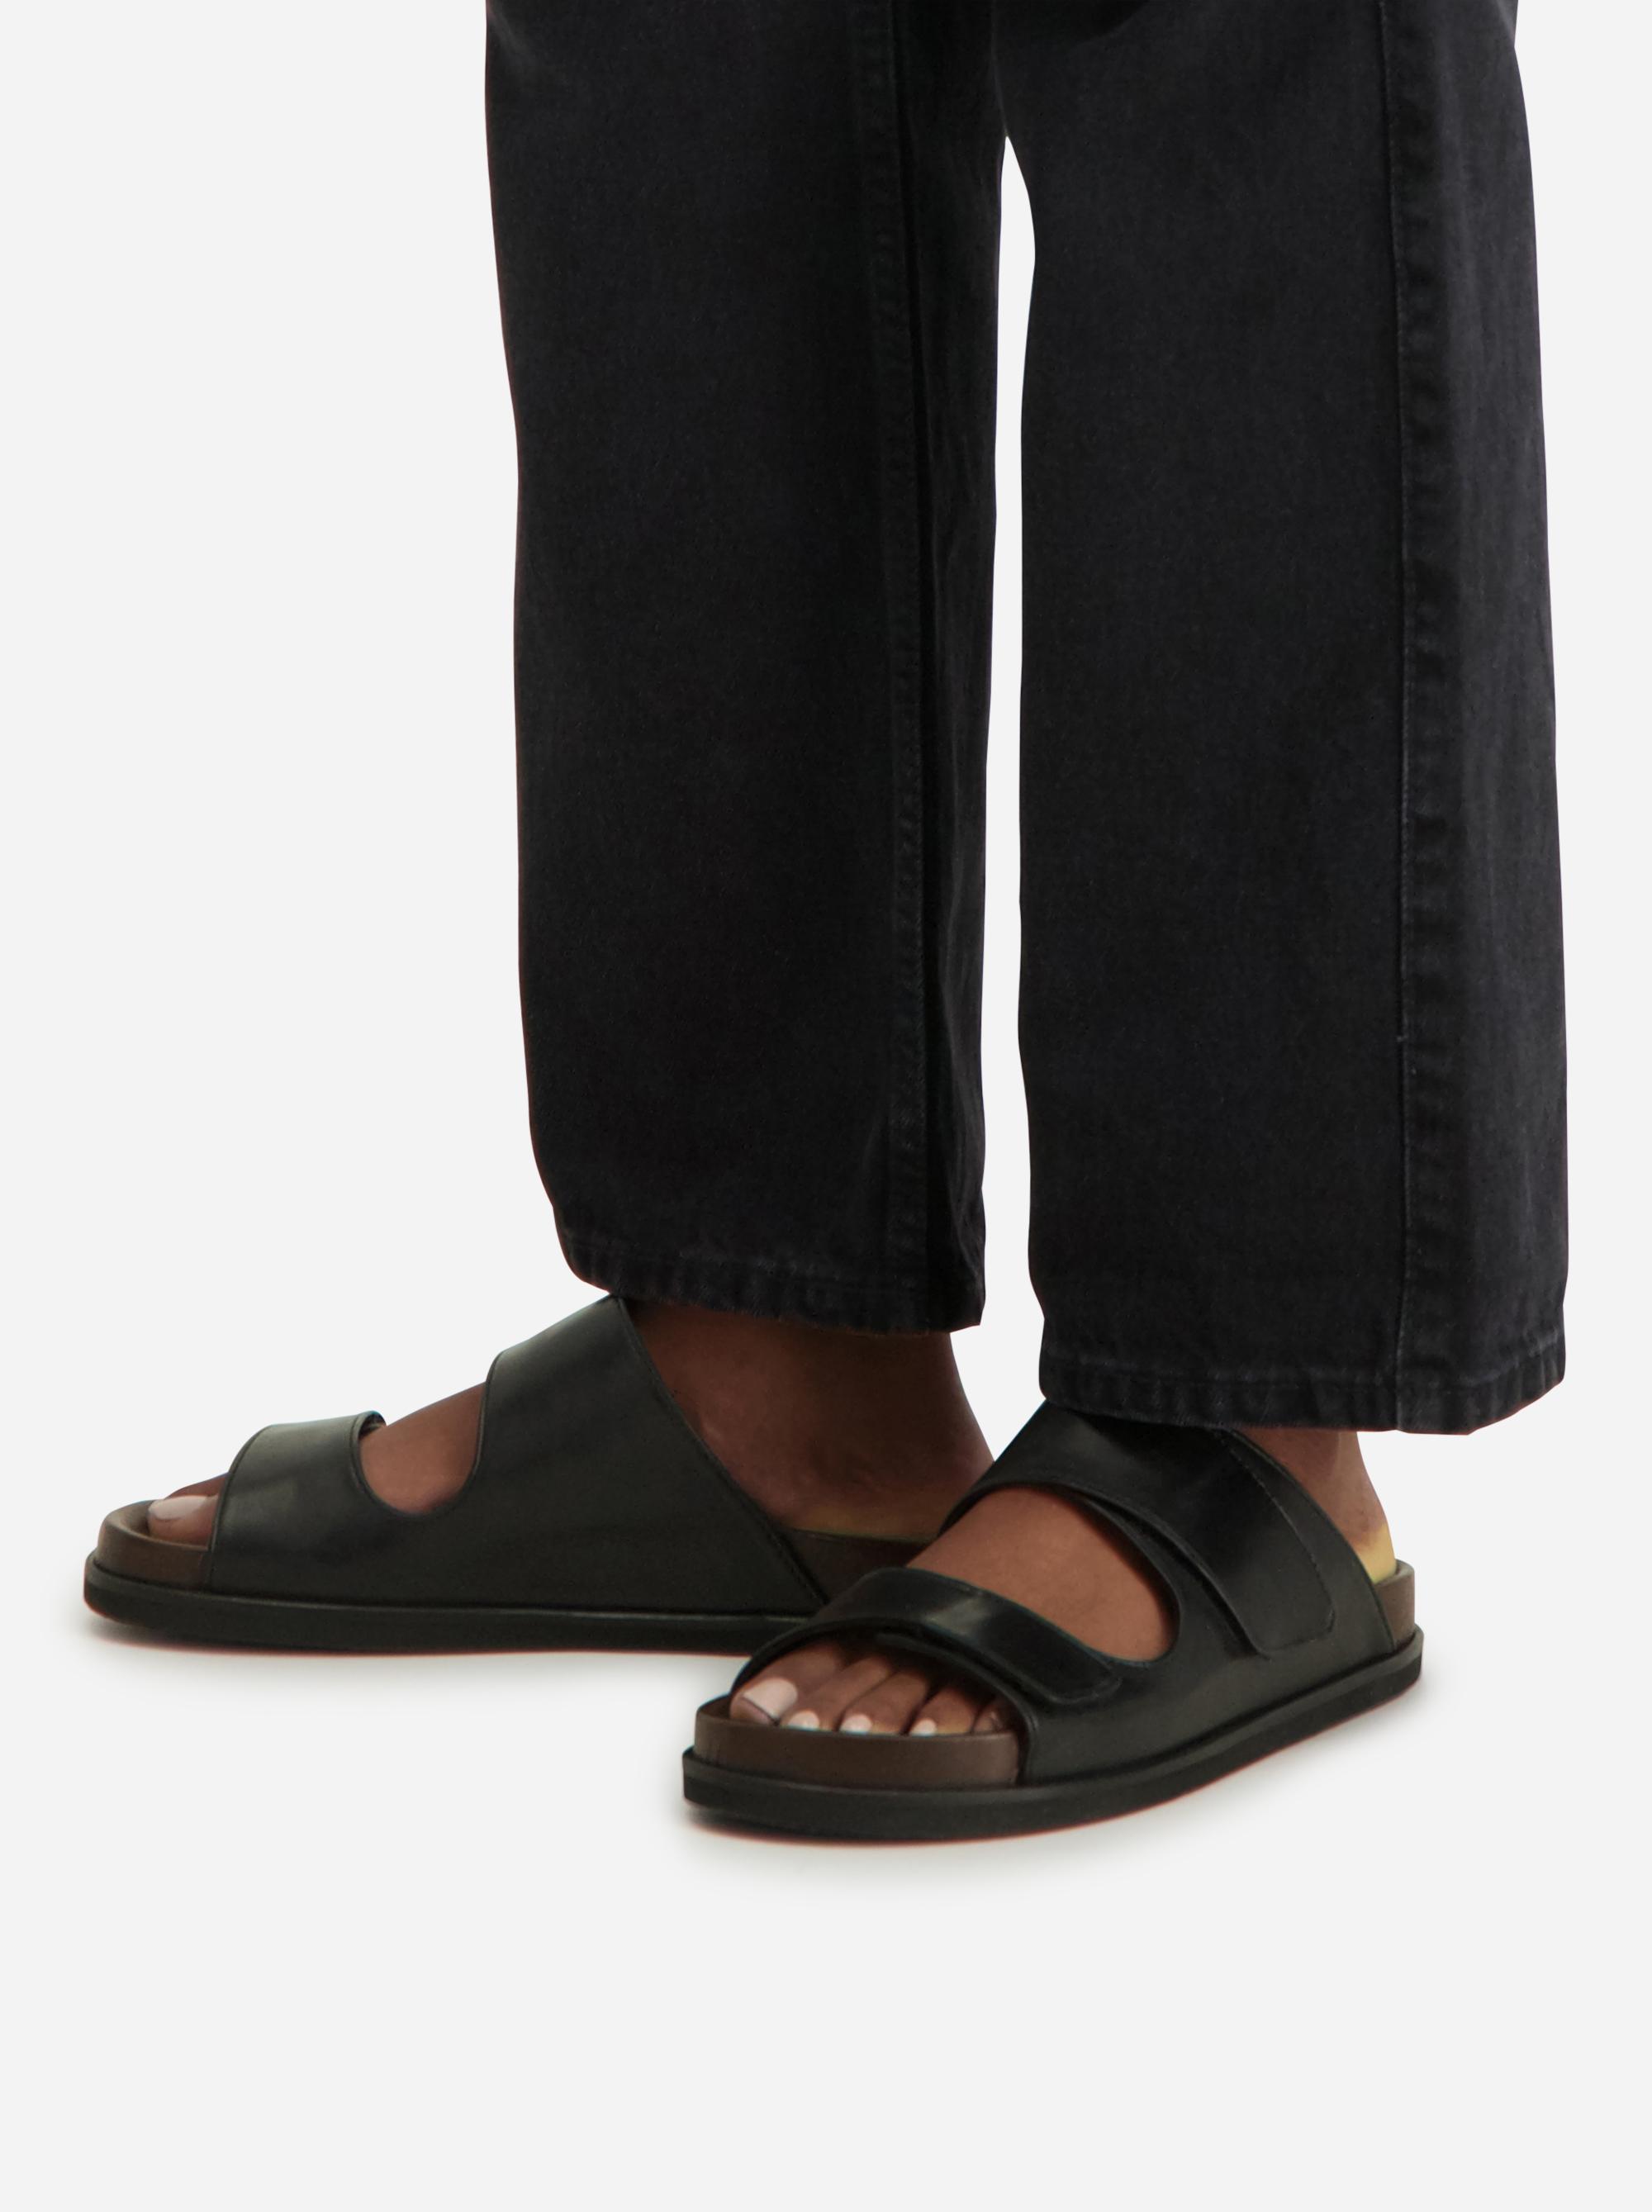 Teym - The Sandal - Women - Black - 1